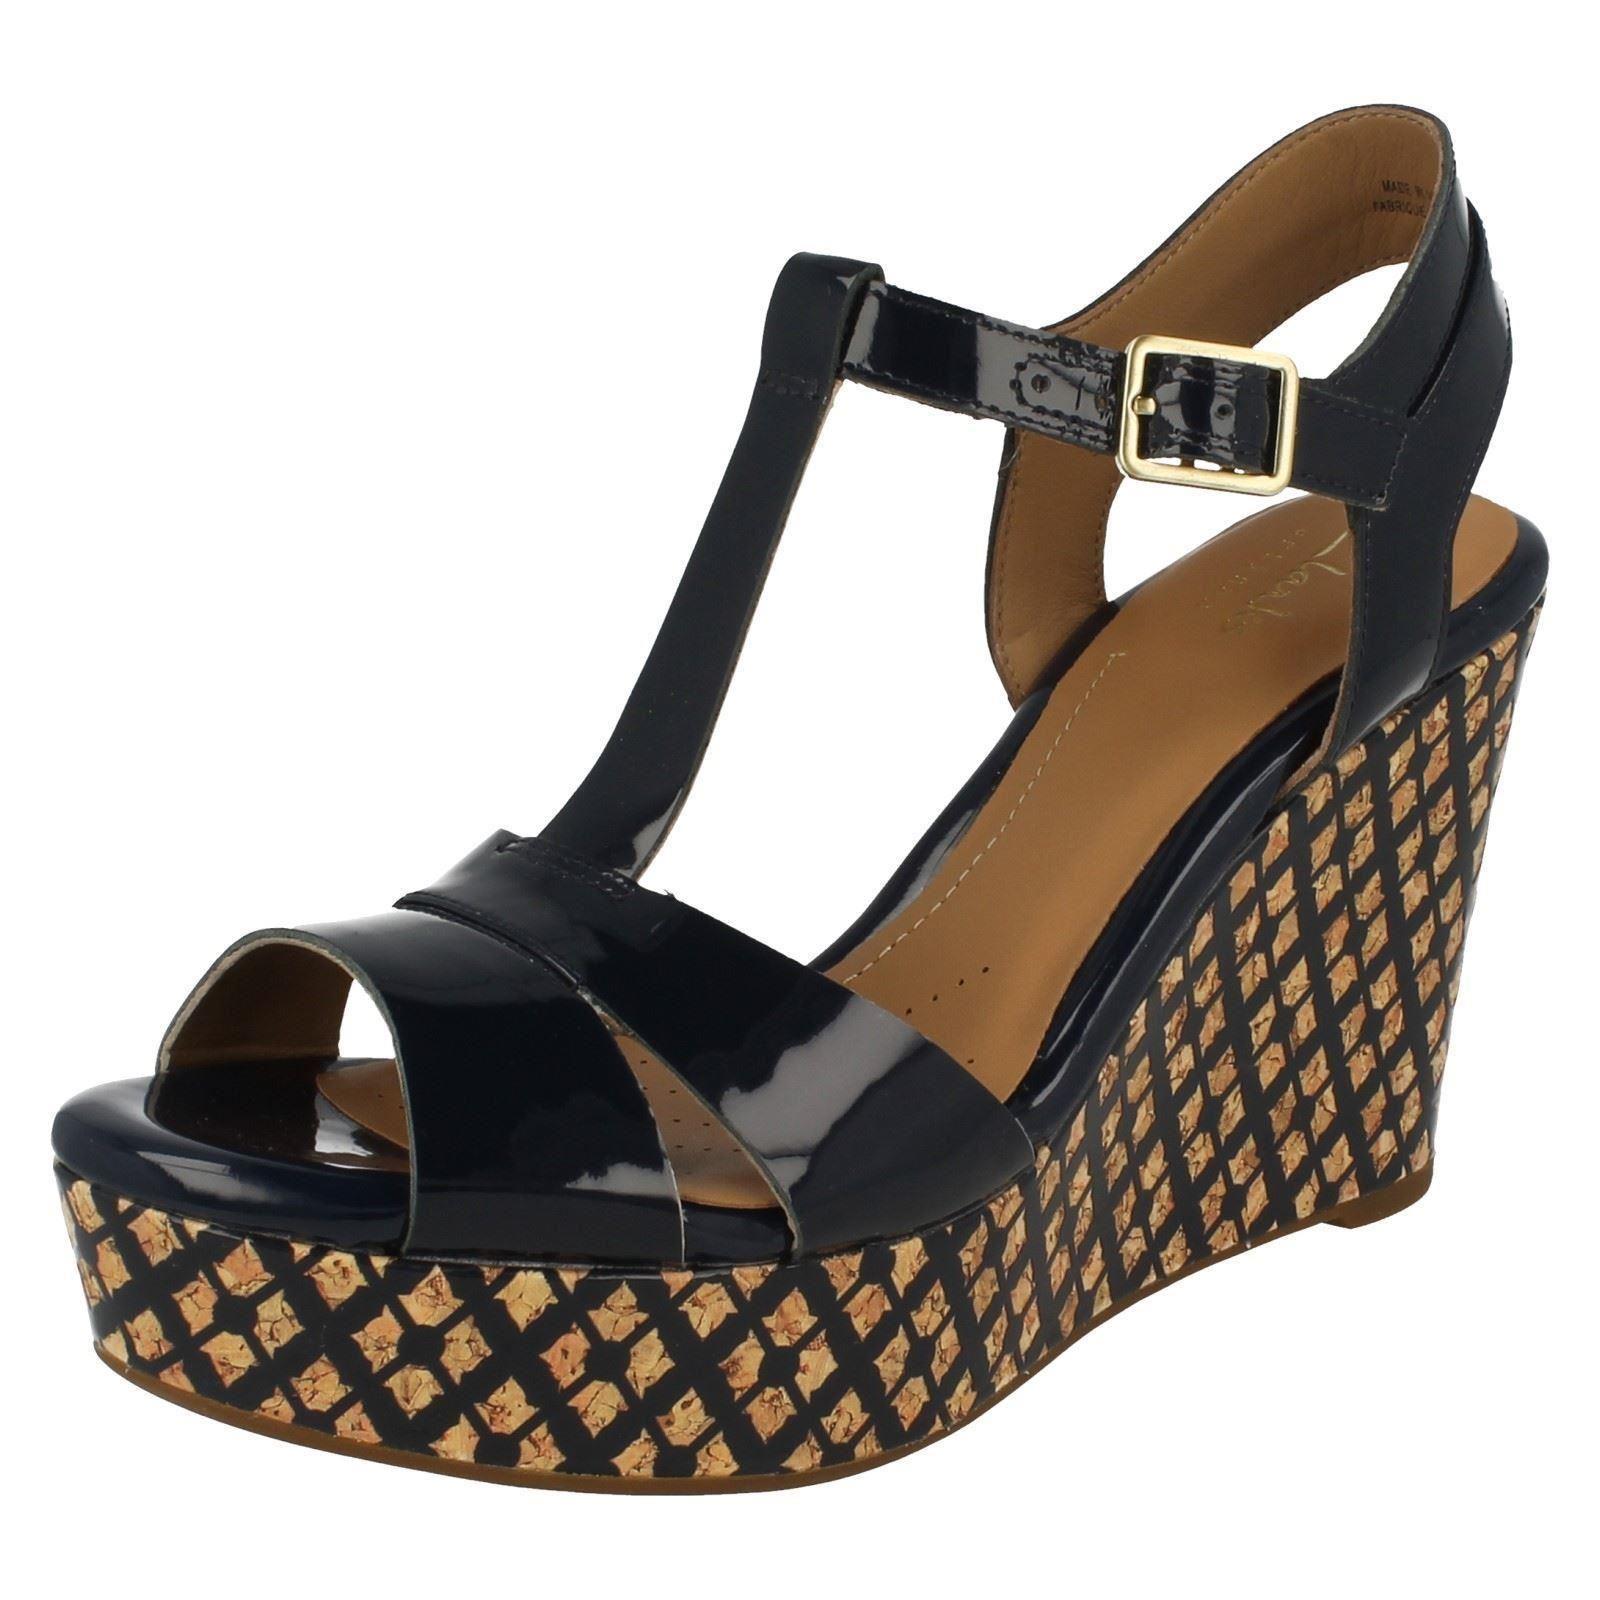 Clarks Ladies Wedge Shoes